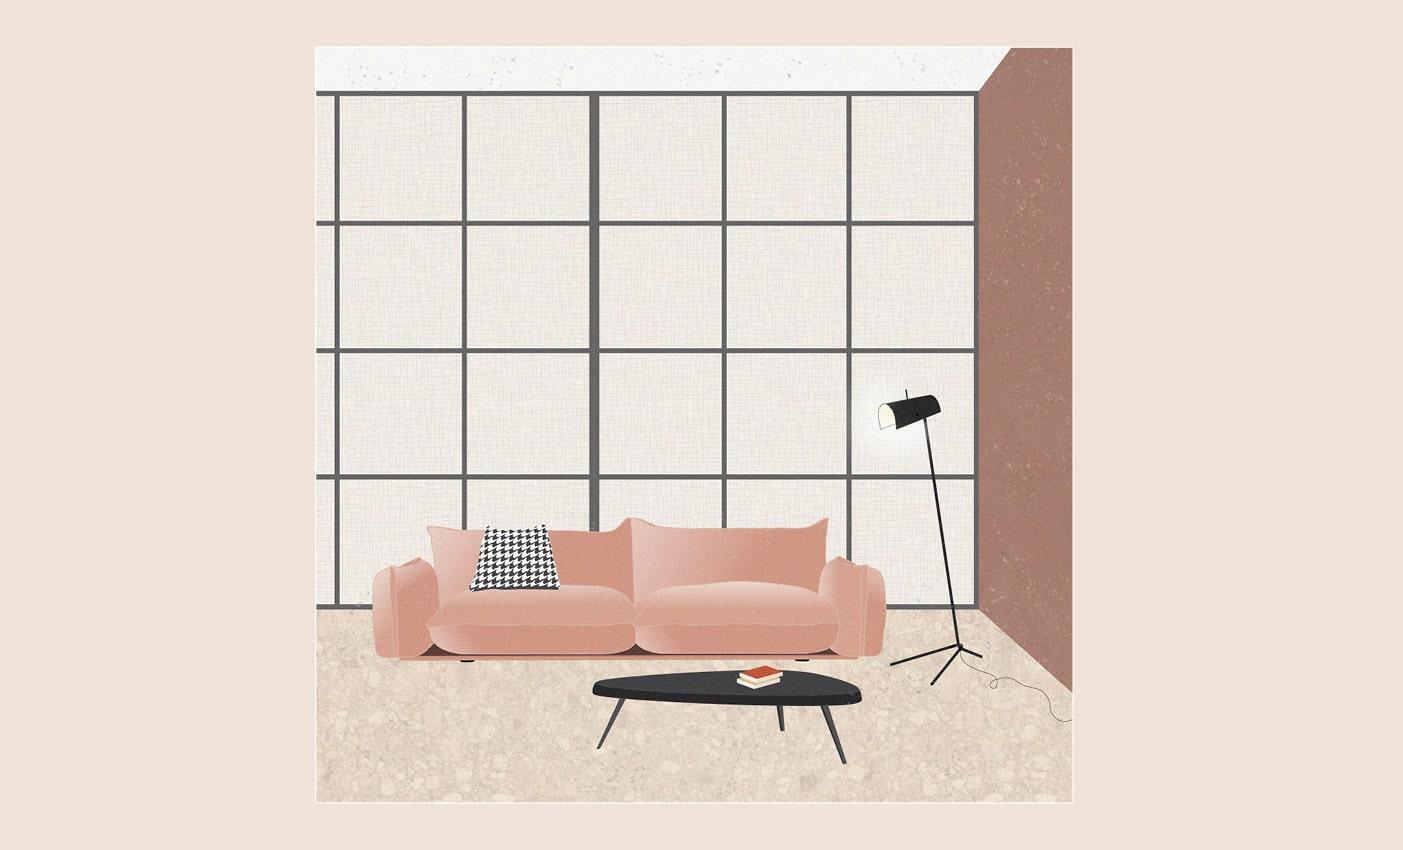 Arflex sofas inspirations with Marenco designed by Esperiri